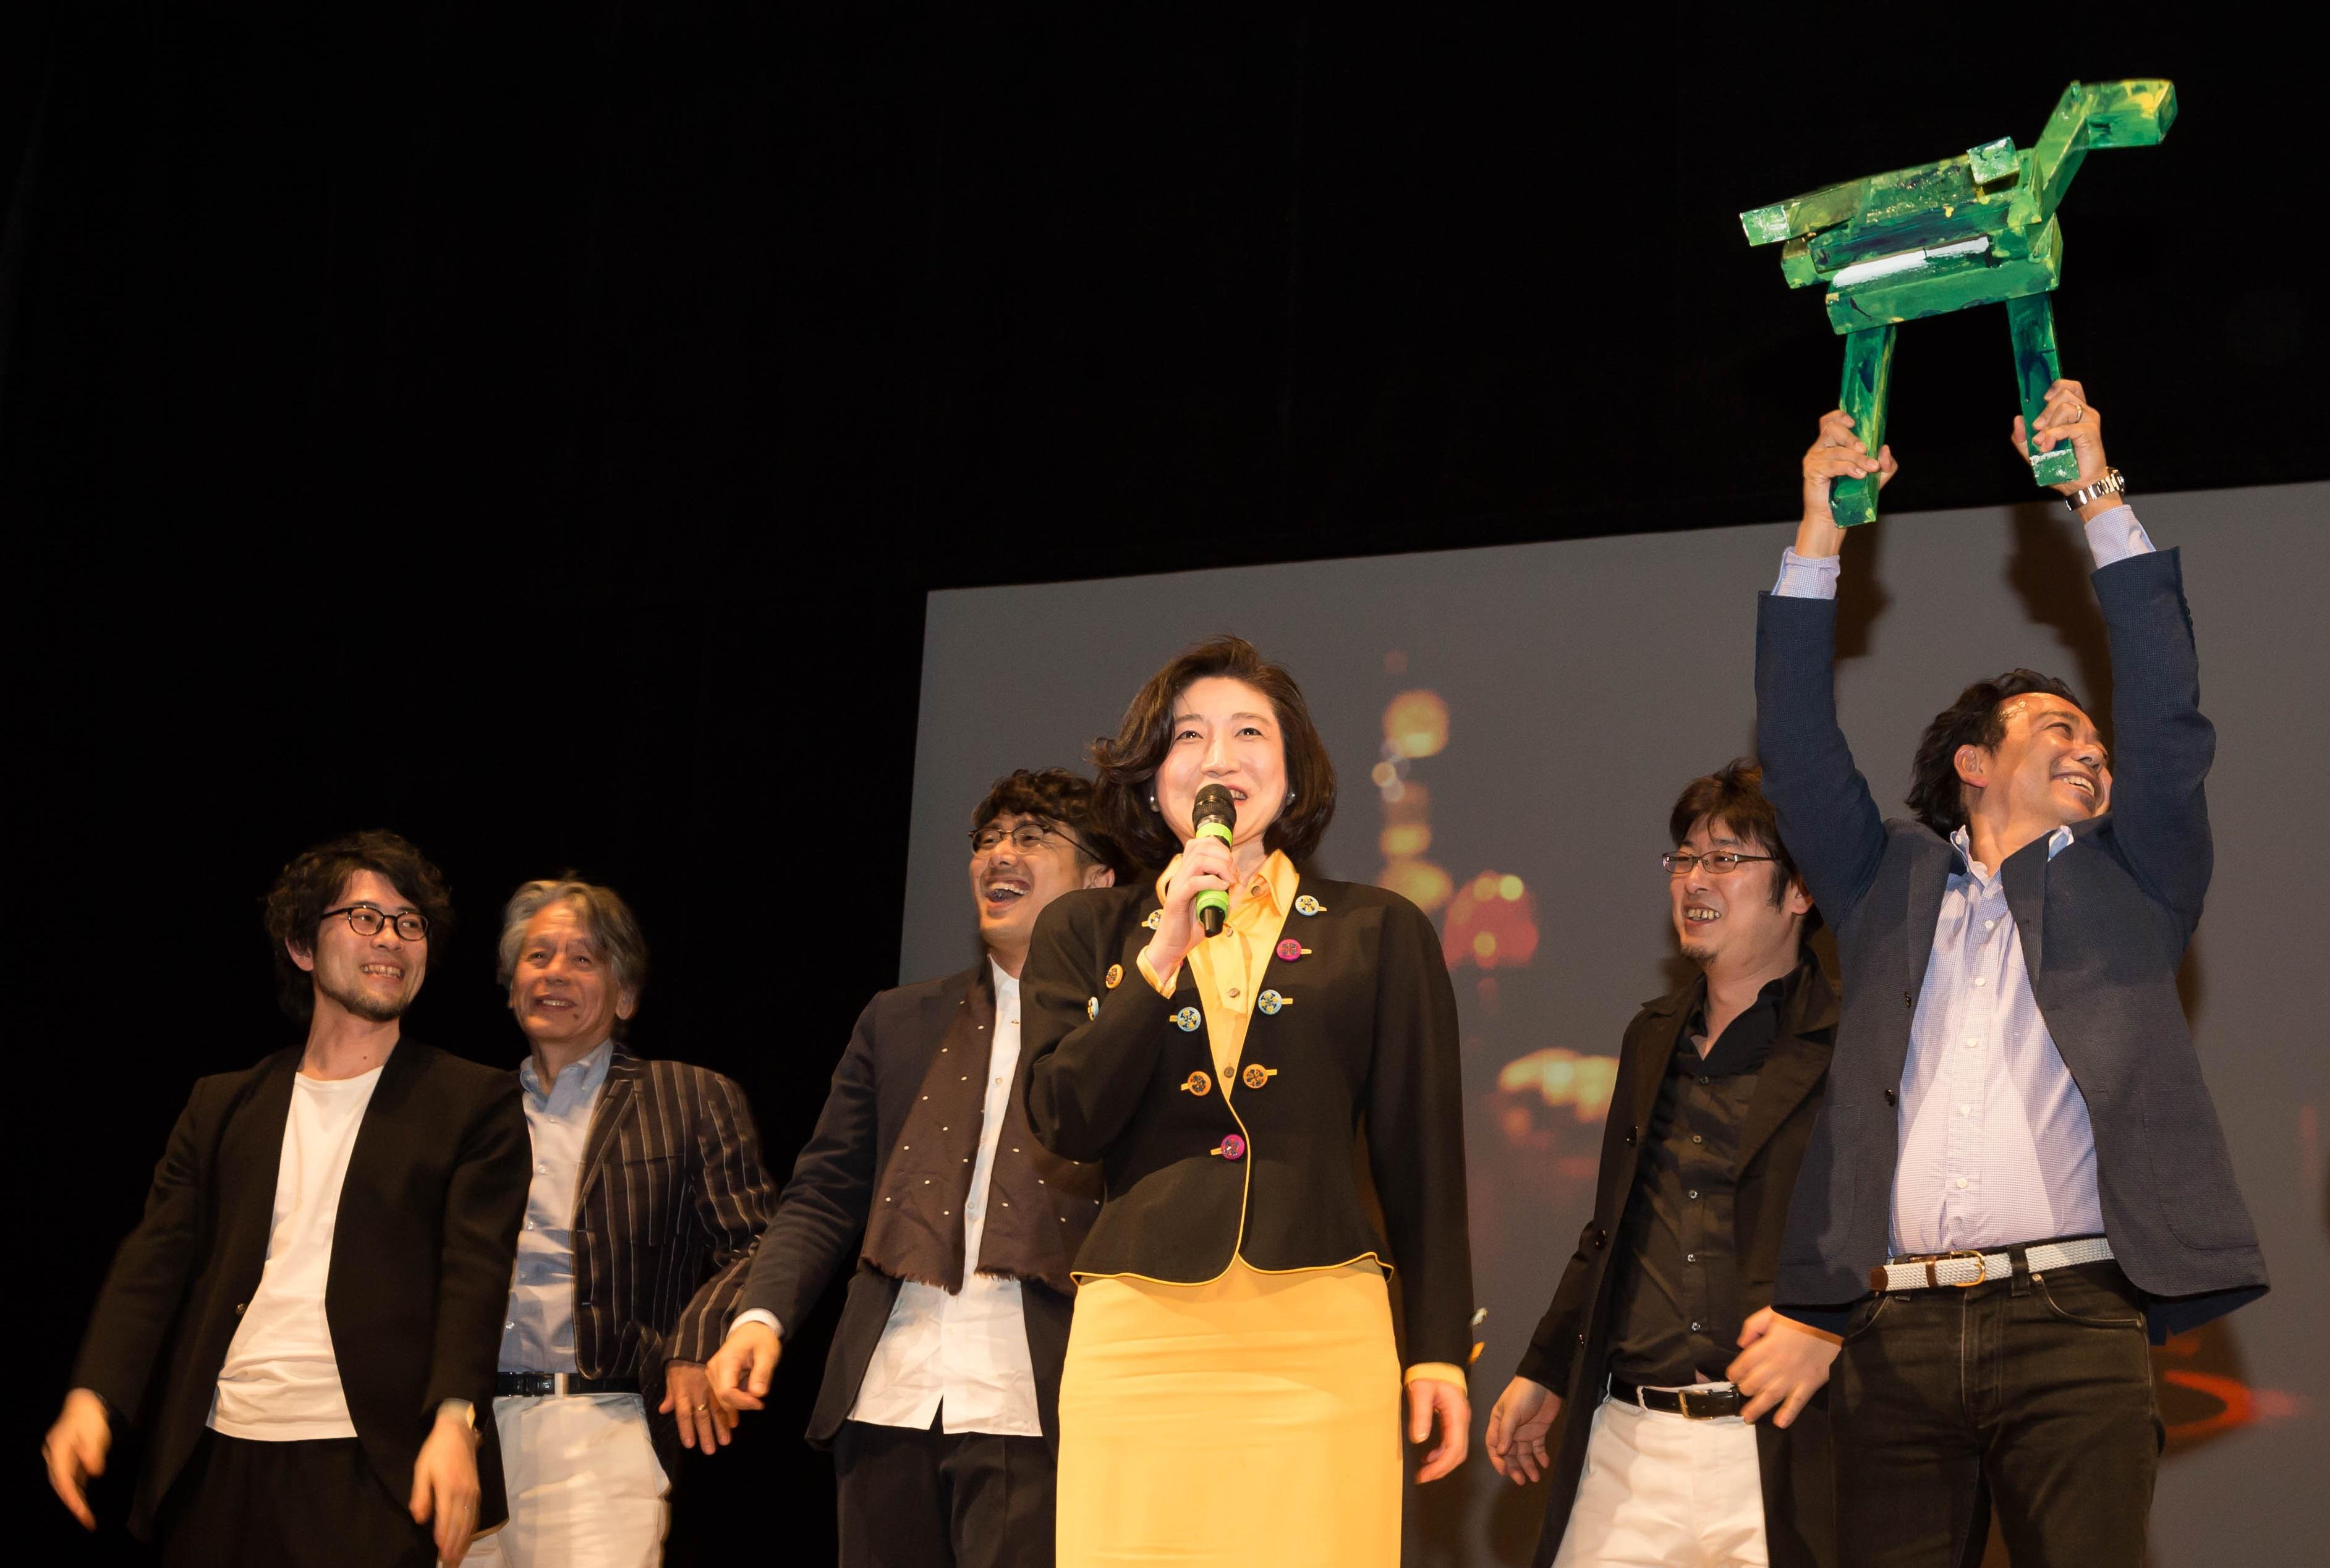 『Milano Design Award 2017』で「ベストストーリーテリング賞」を受賞